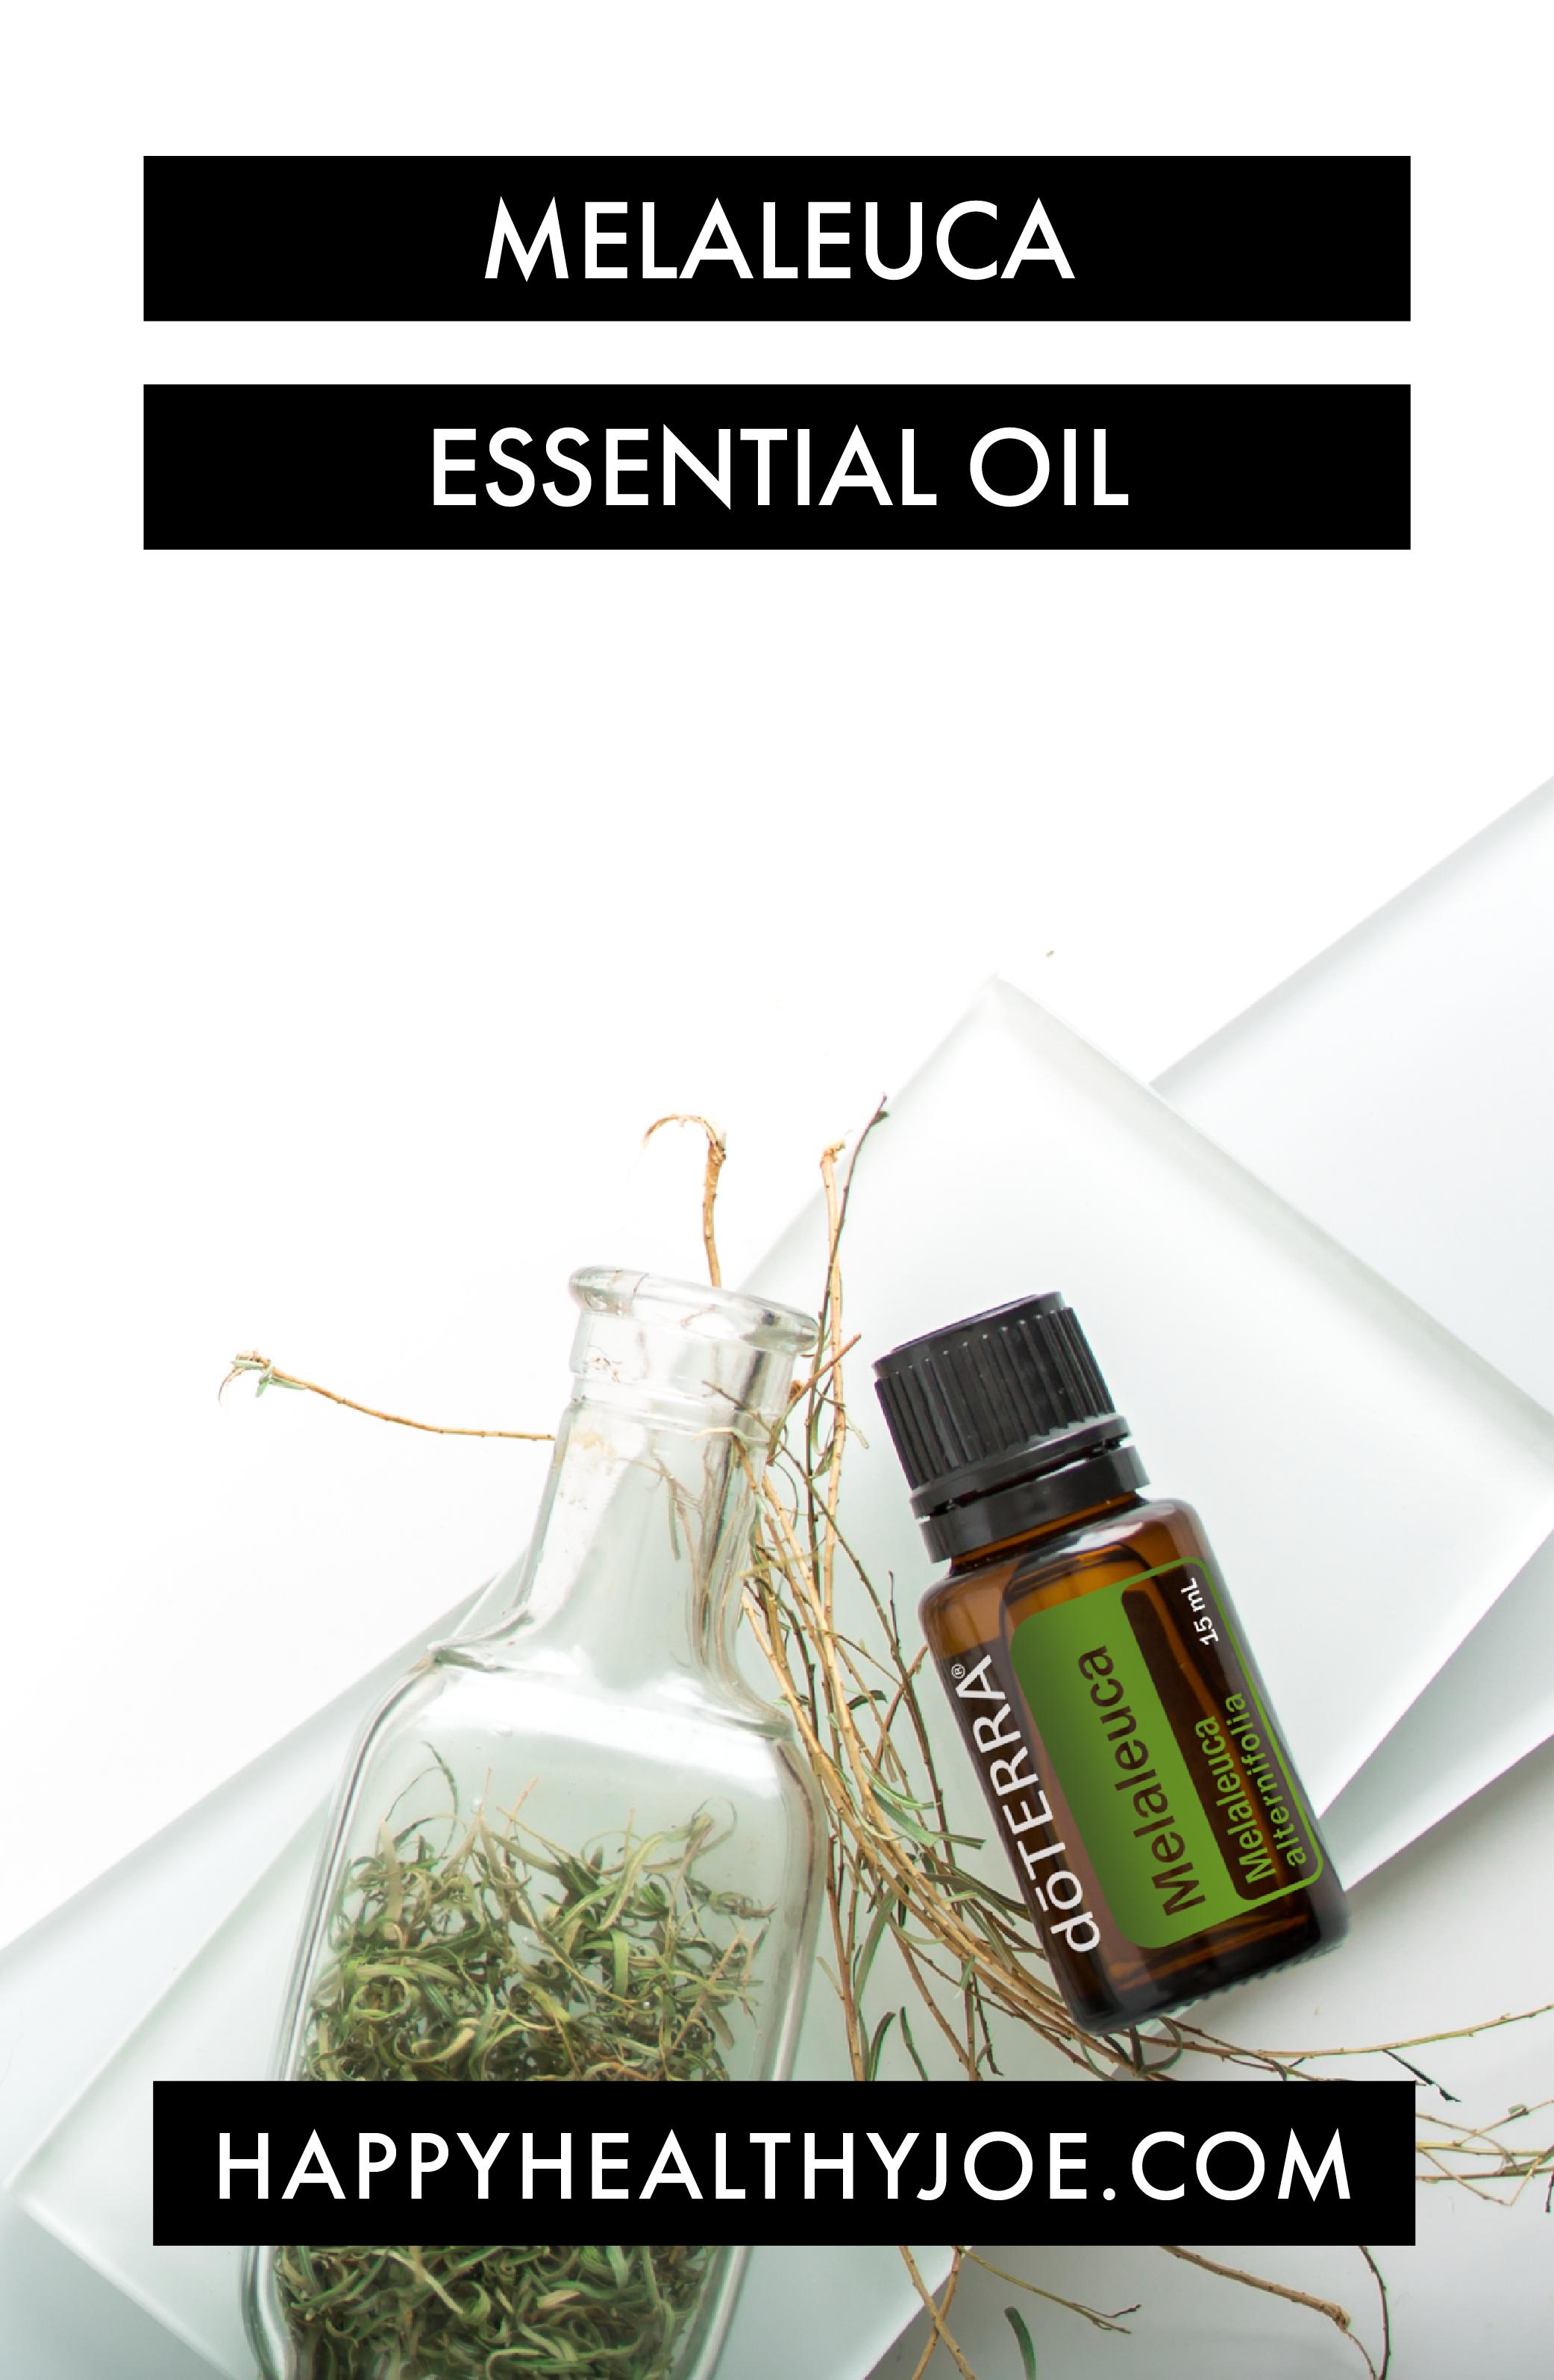 Top doTERRA Essential Oils For Fitness - Melaleuca Tea Tree Essential Oil